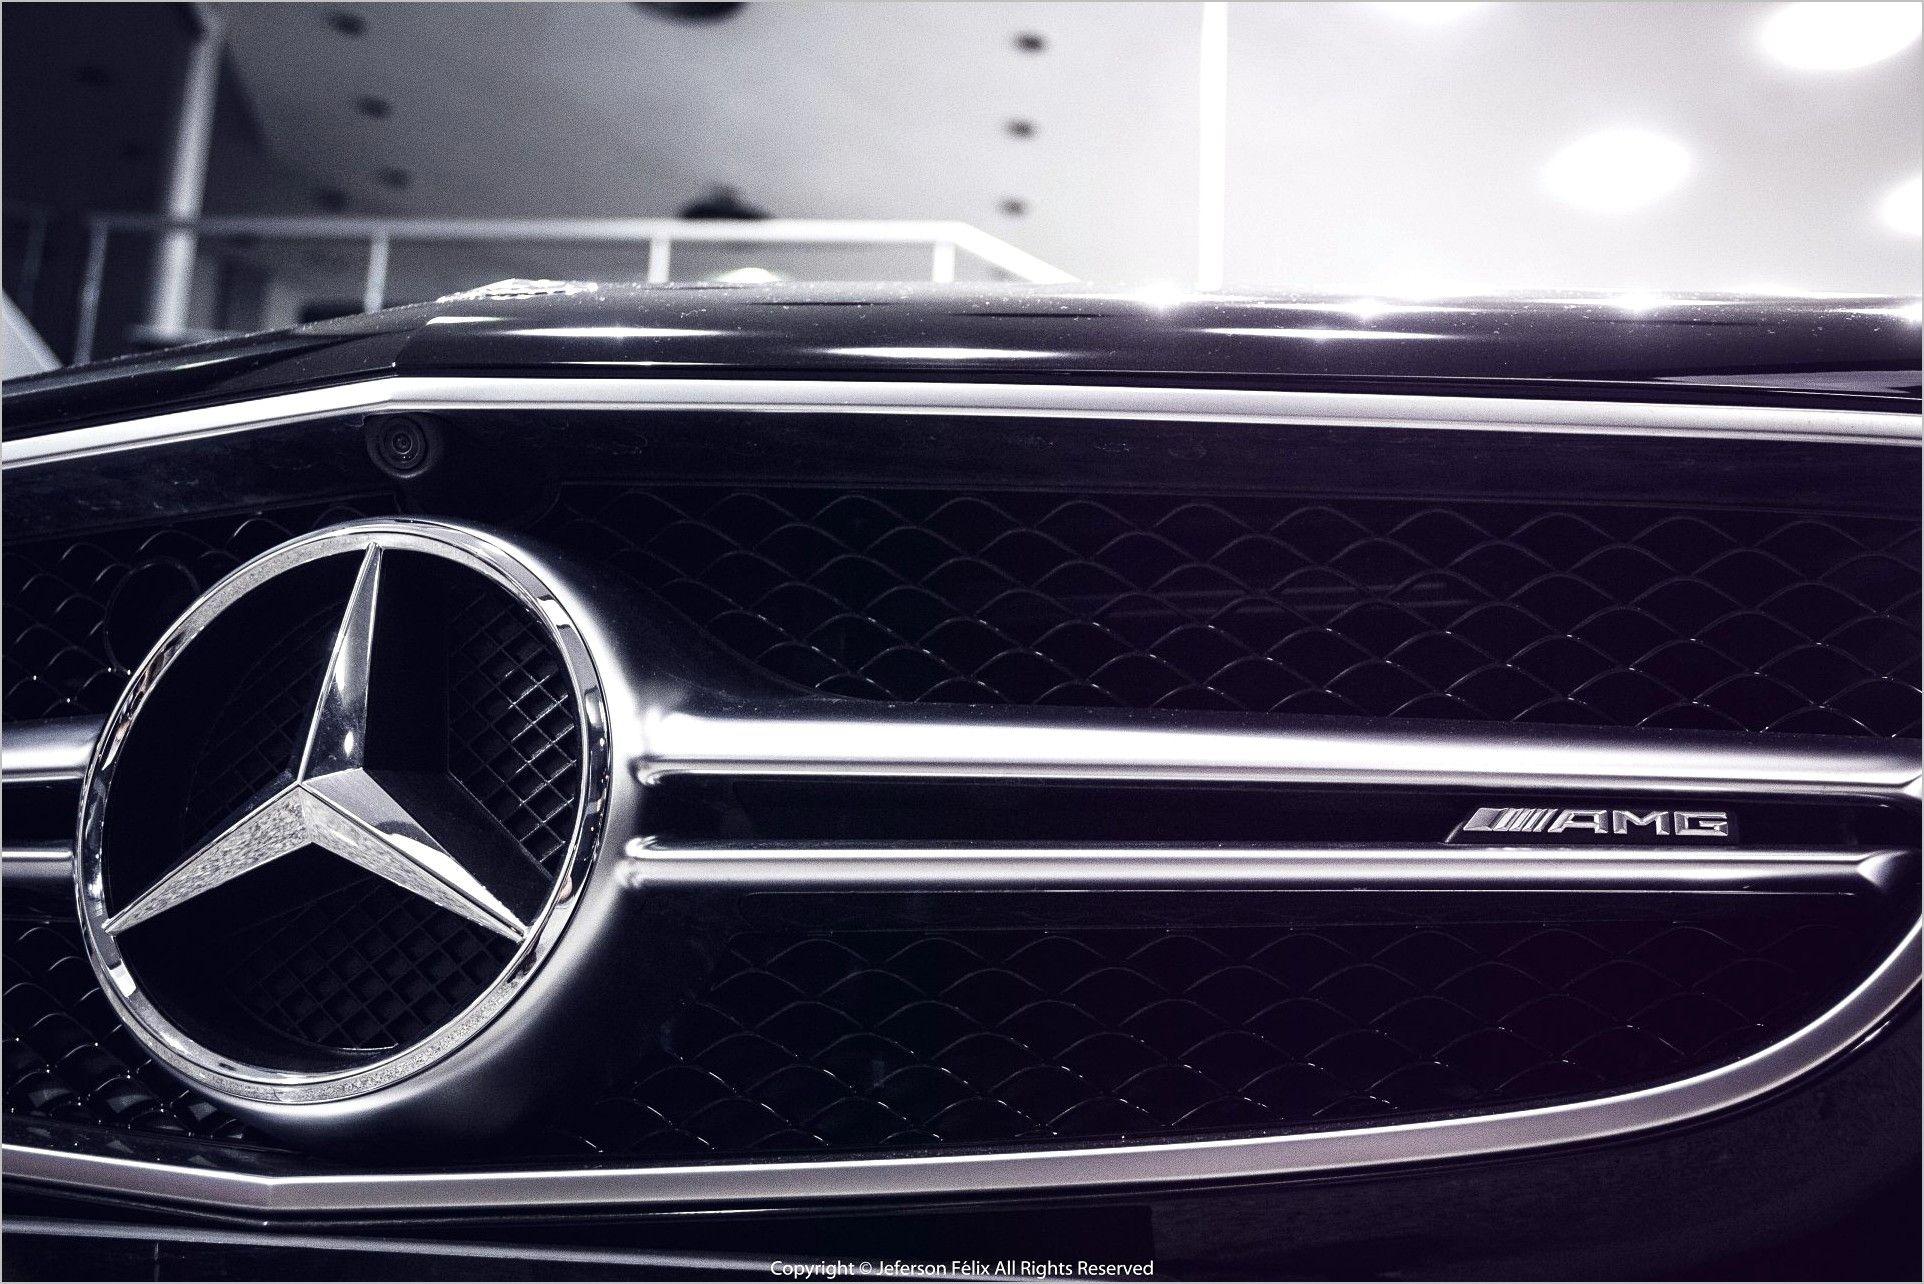 4k Wallpaper Amg 1 In 2020 Mercedes Benz High Resolution